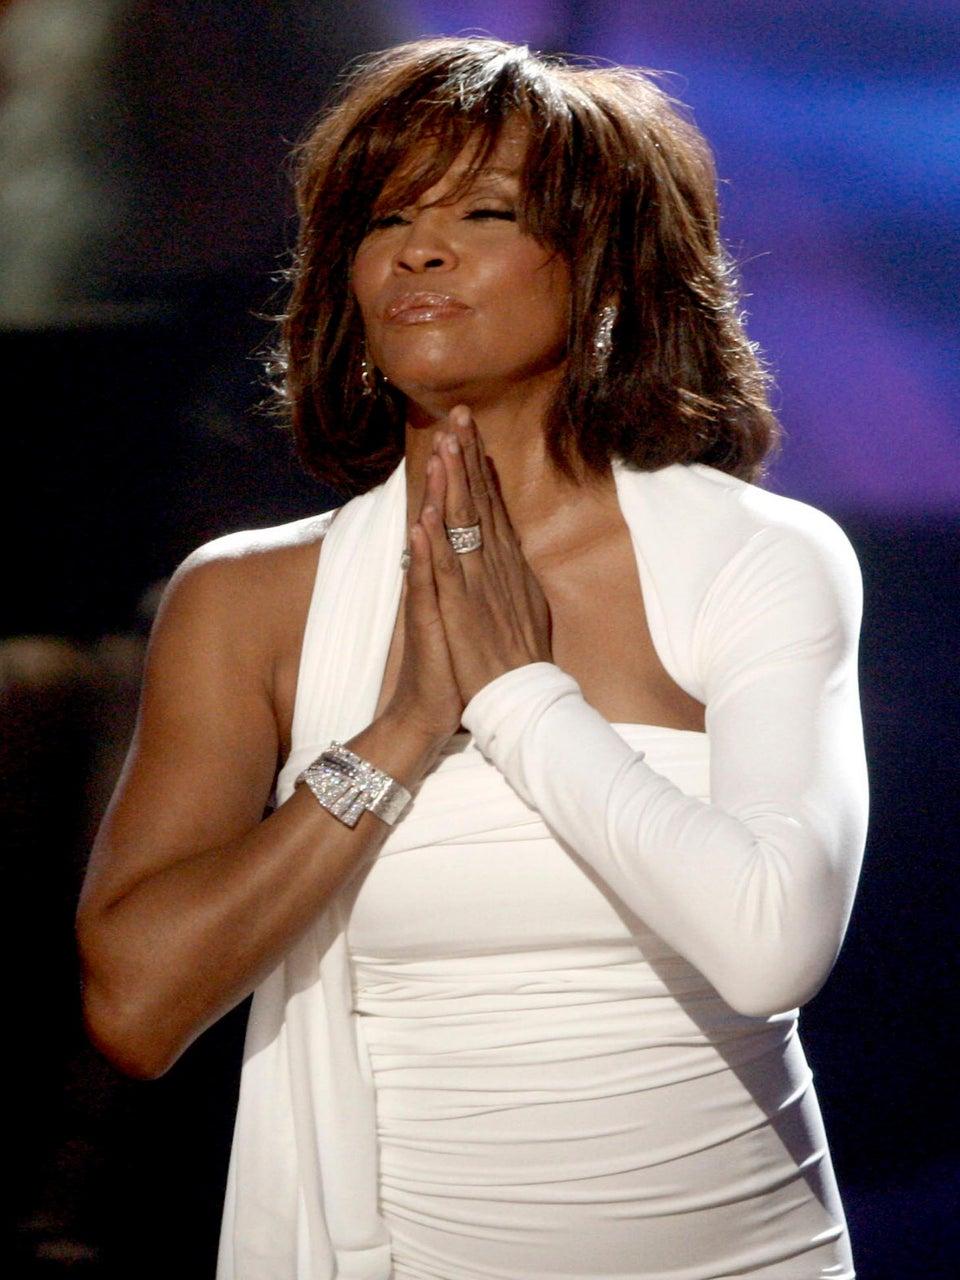 Coffee Talk: New Whitney Houston Album to Hit Shelves in November